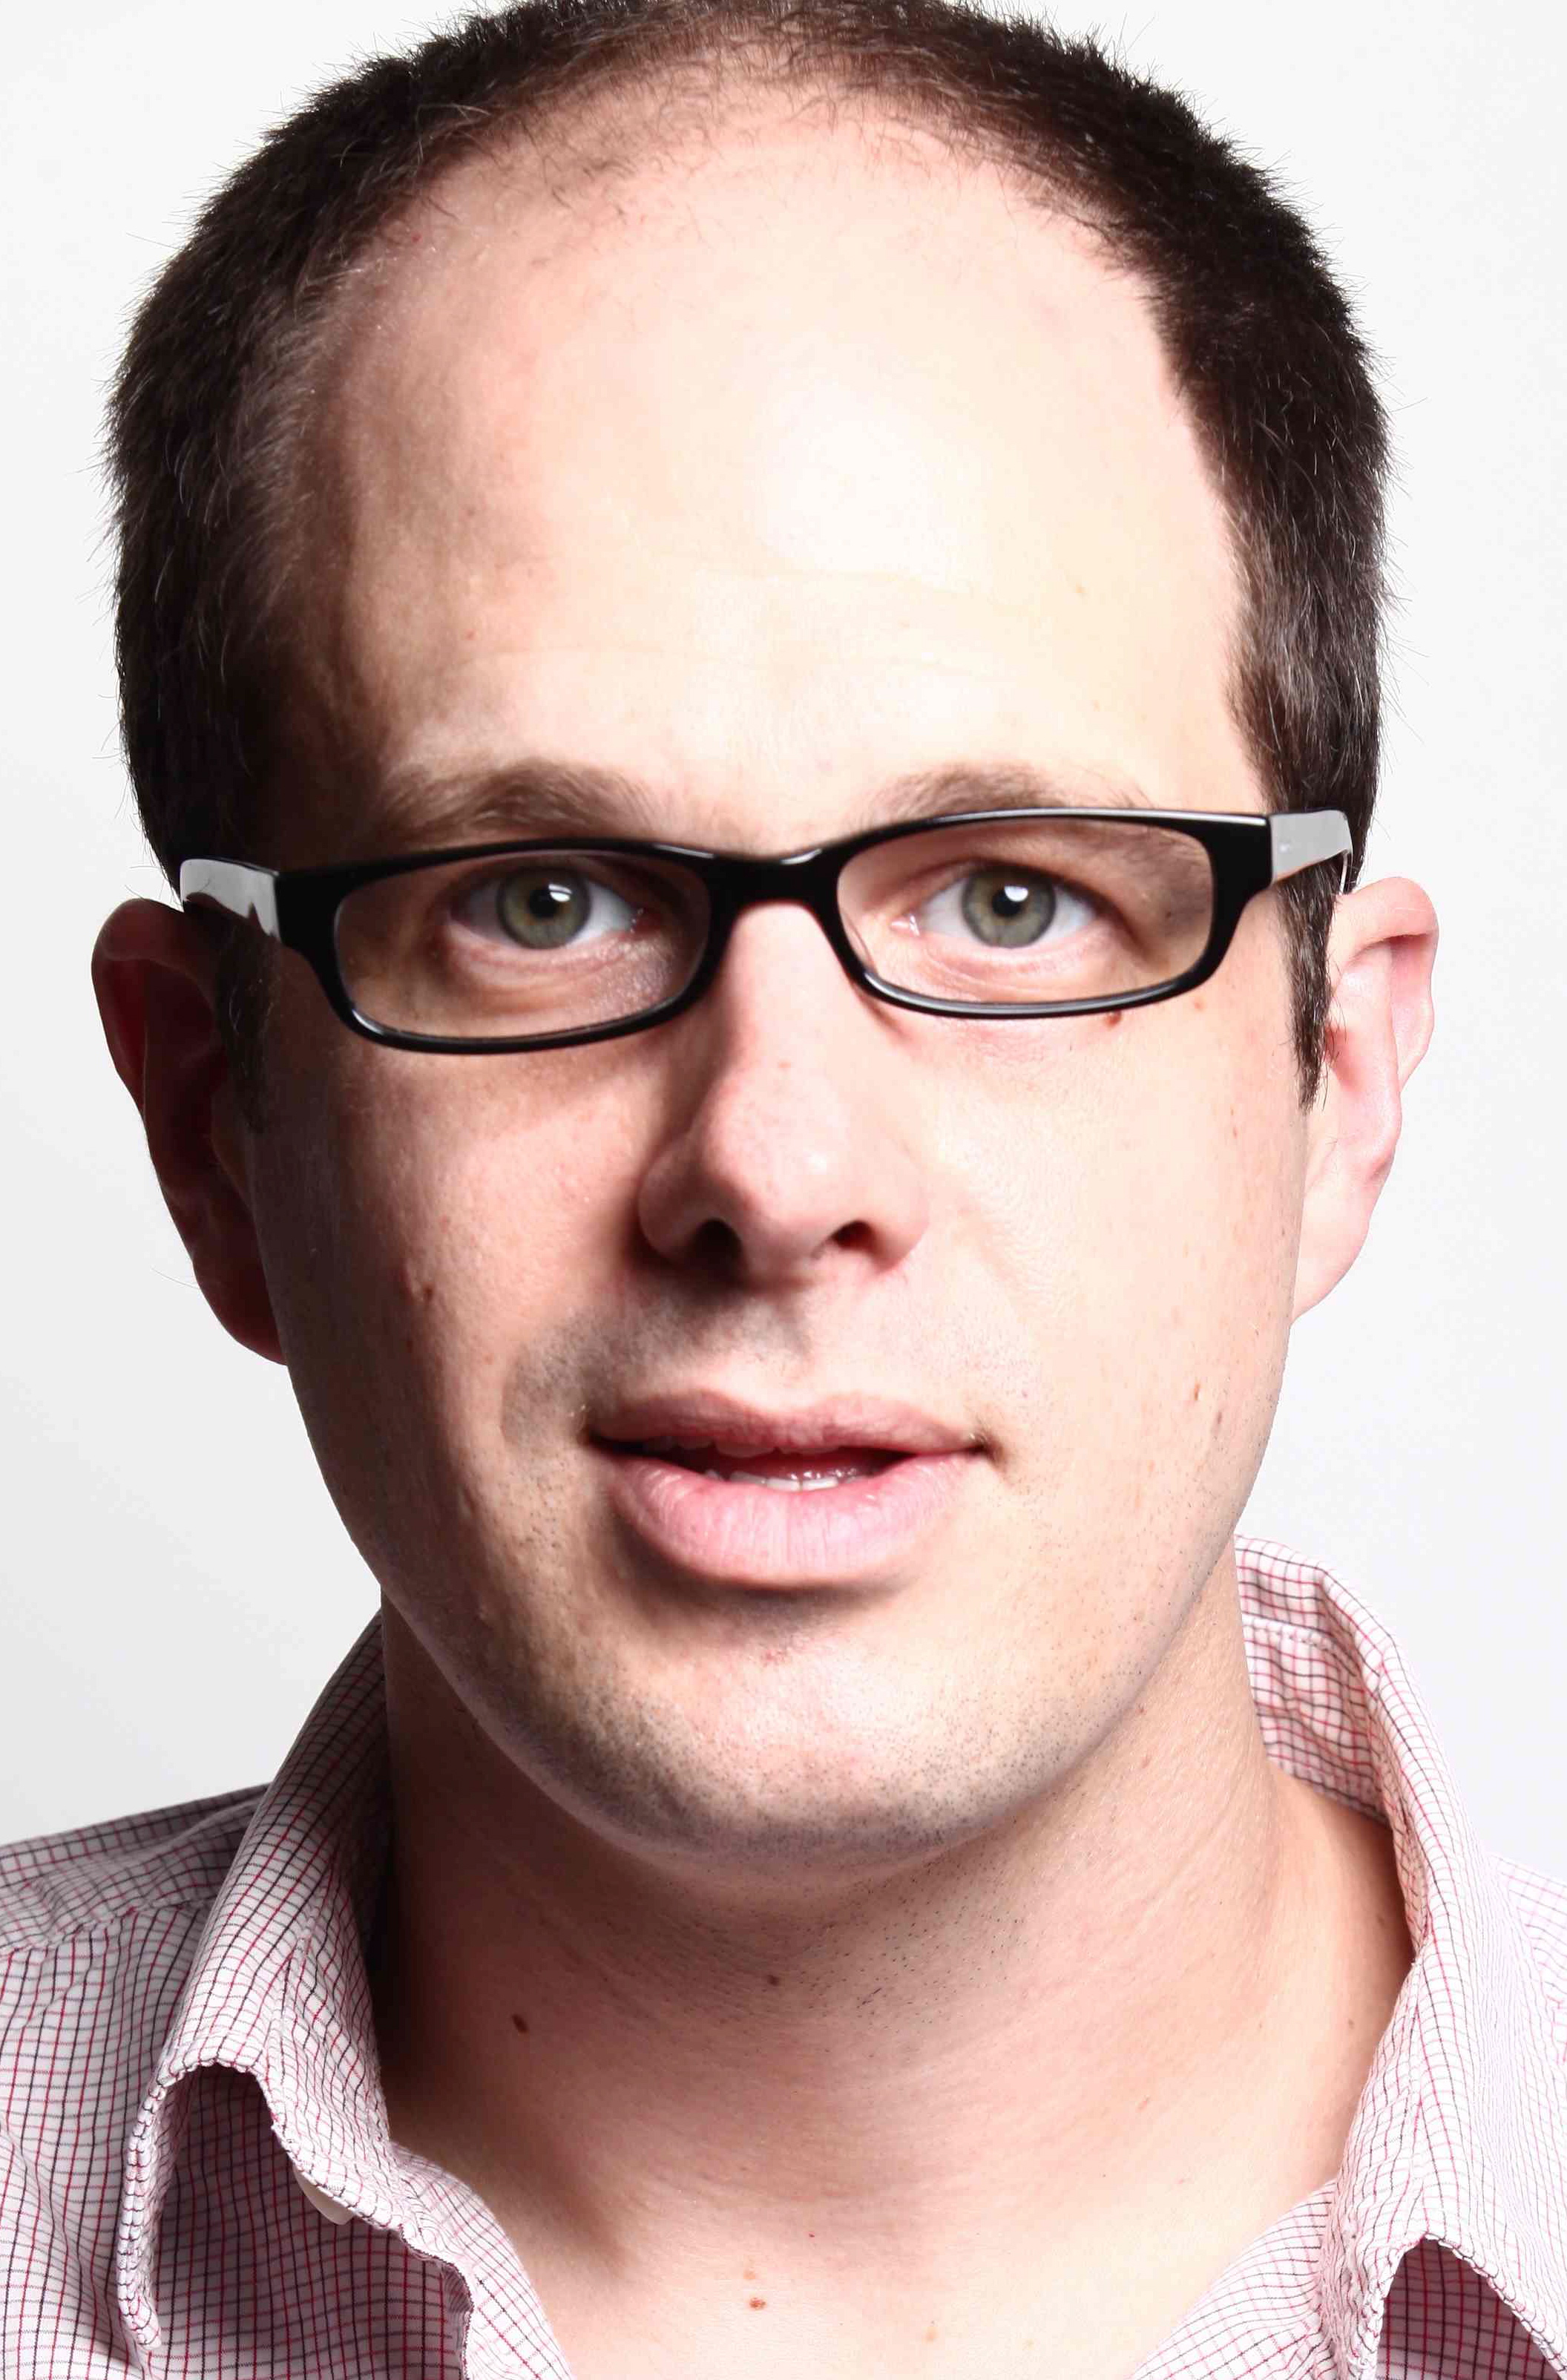 Mike Ostroski Glasses Pink Shirt (Zaugh) Website.jpg